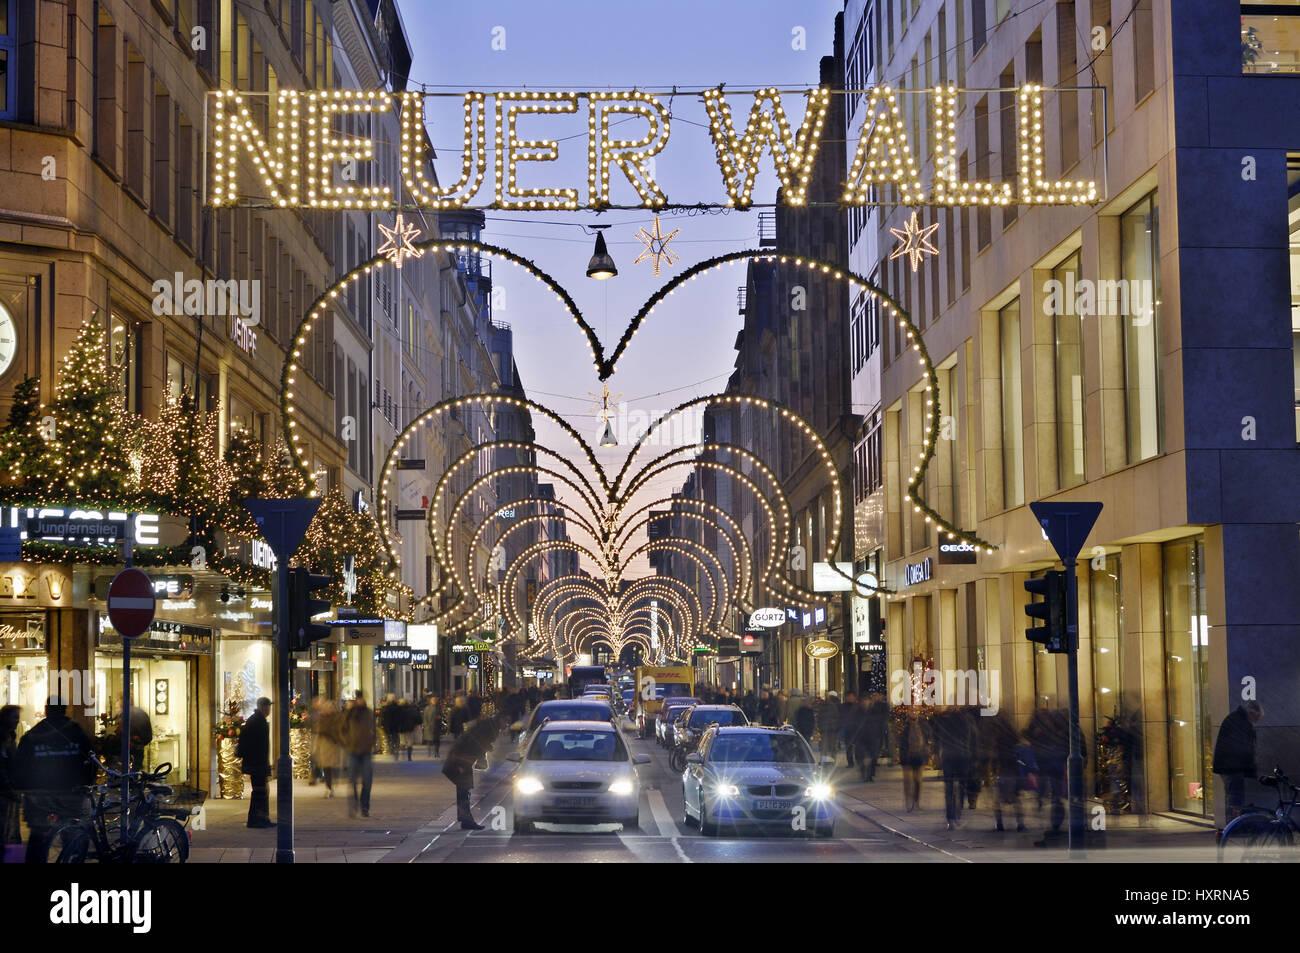 Neuer Wall Weihnachtsbeleuchtung.New Embankment With Christmas Lighting In Hamburg Germany Europe